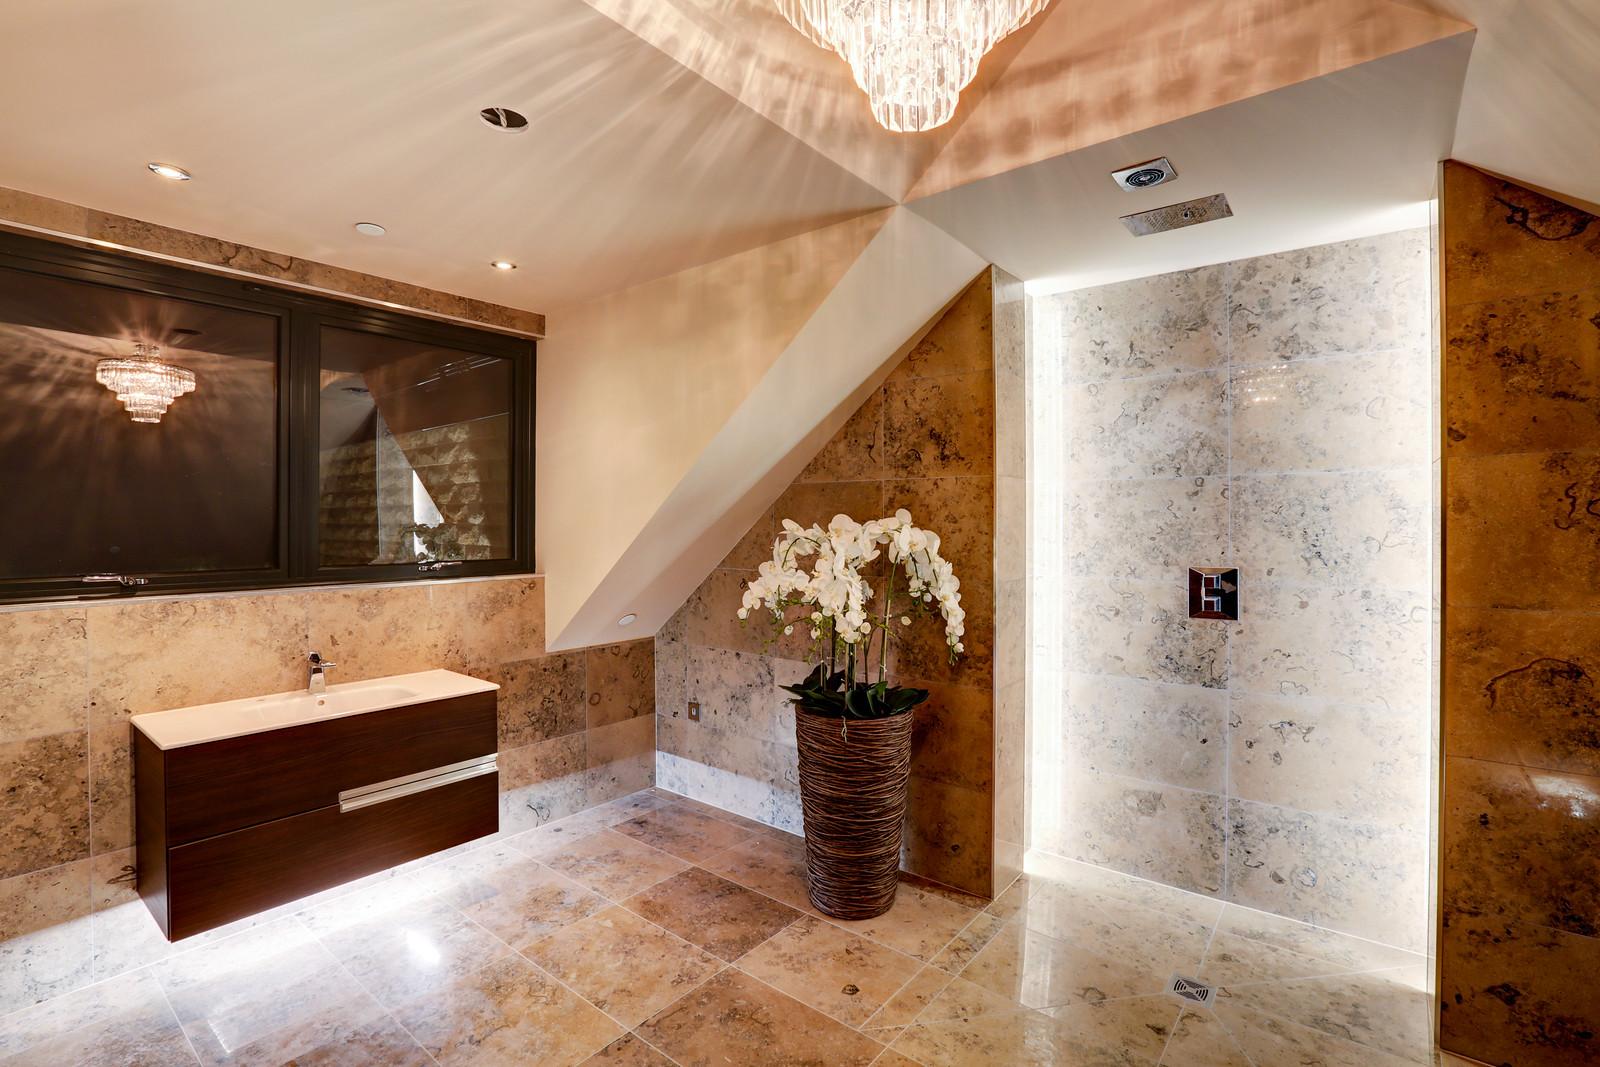 Shower room in marble, Tanglewood, Colston Bassett by Guy Phoenix